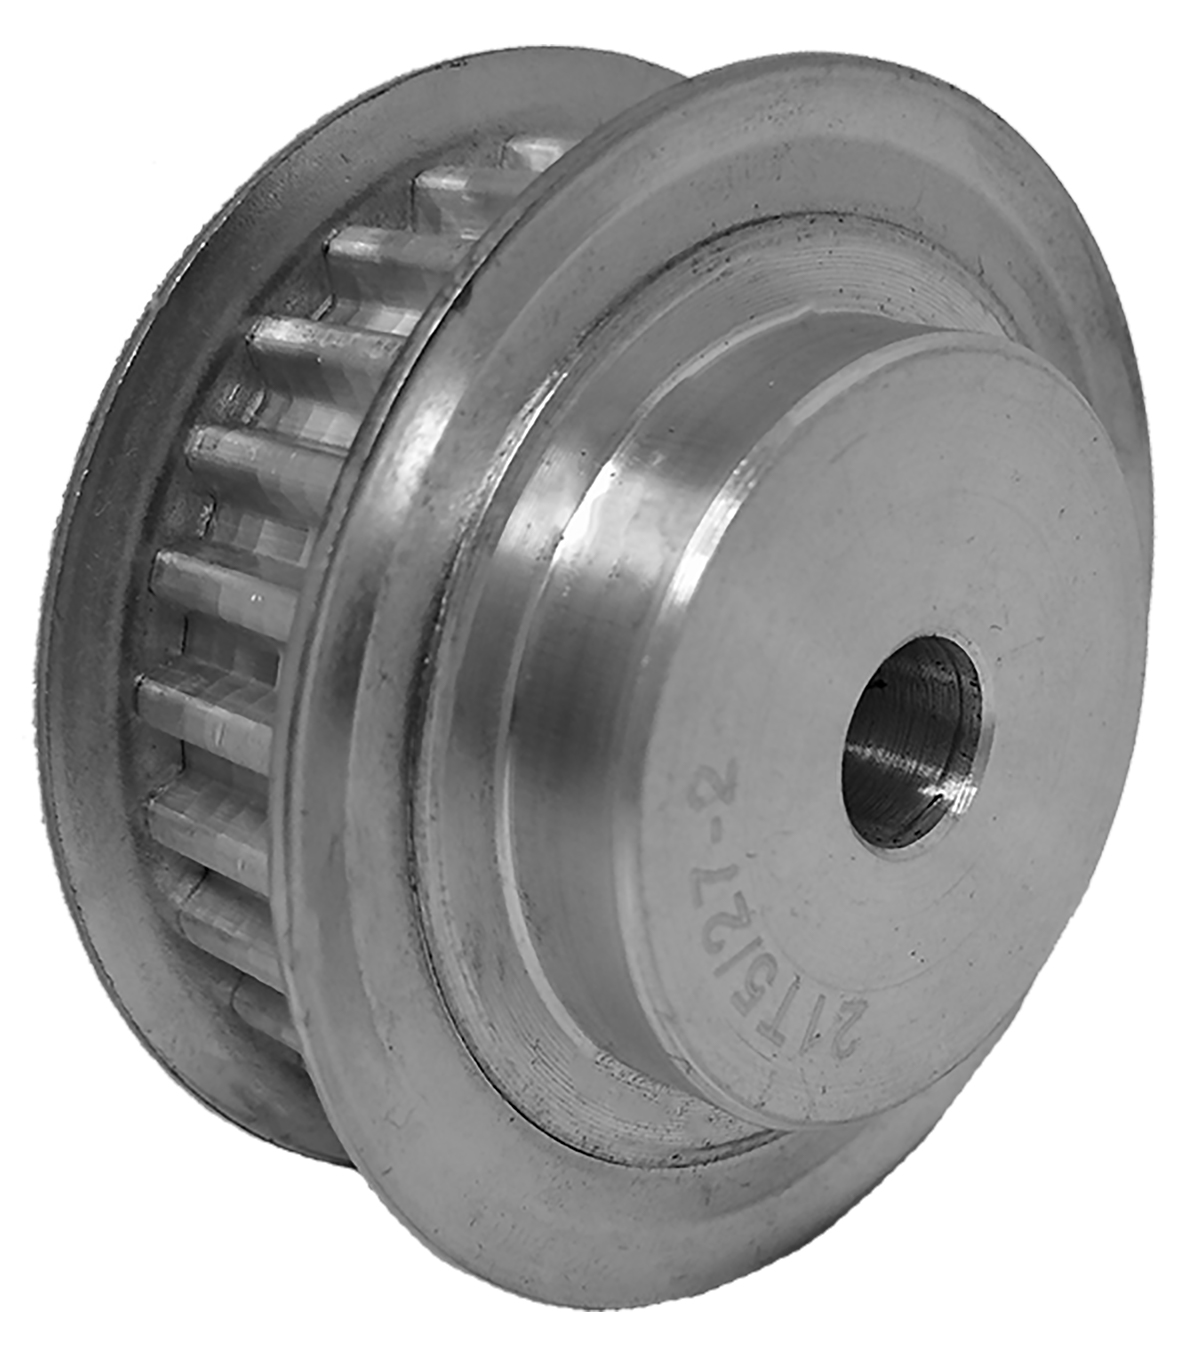 21T5/27-2 - Aluminum Metric Pulleys